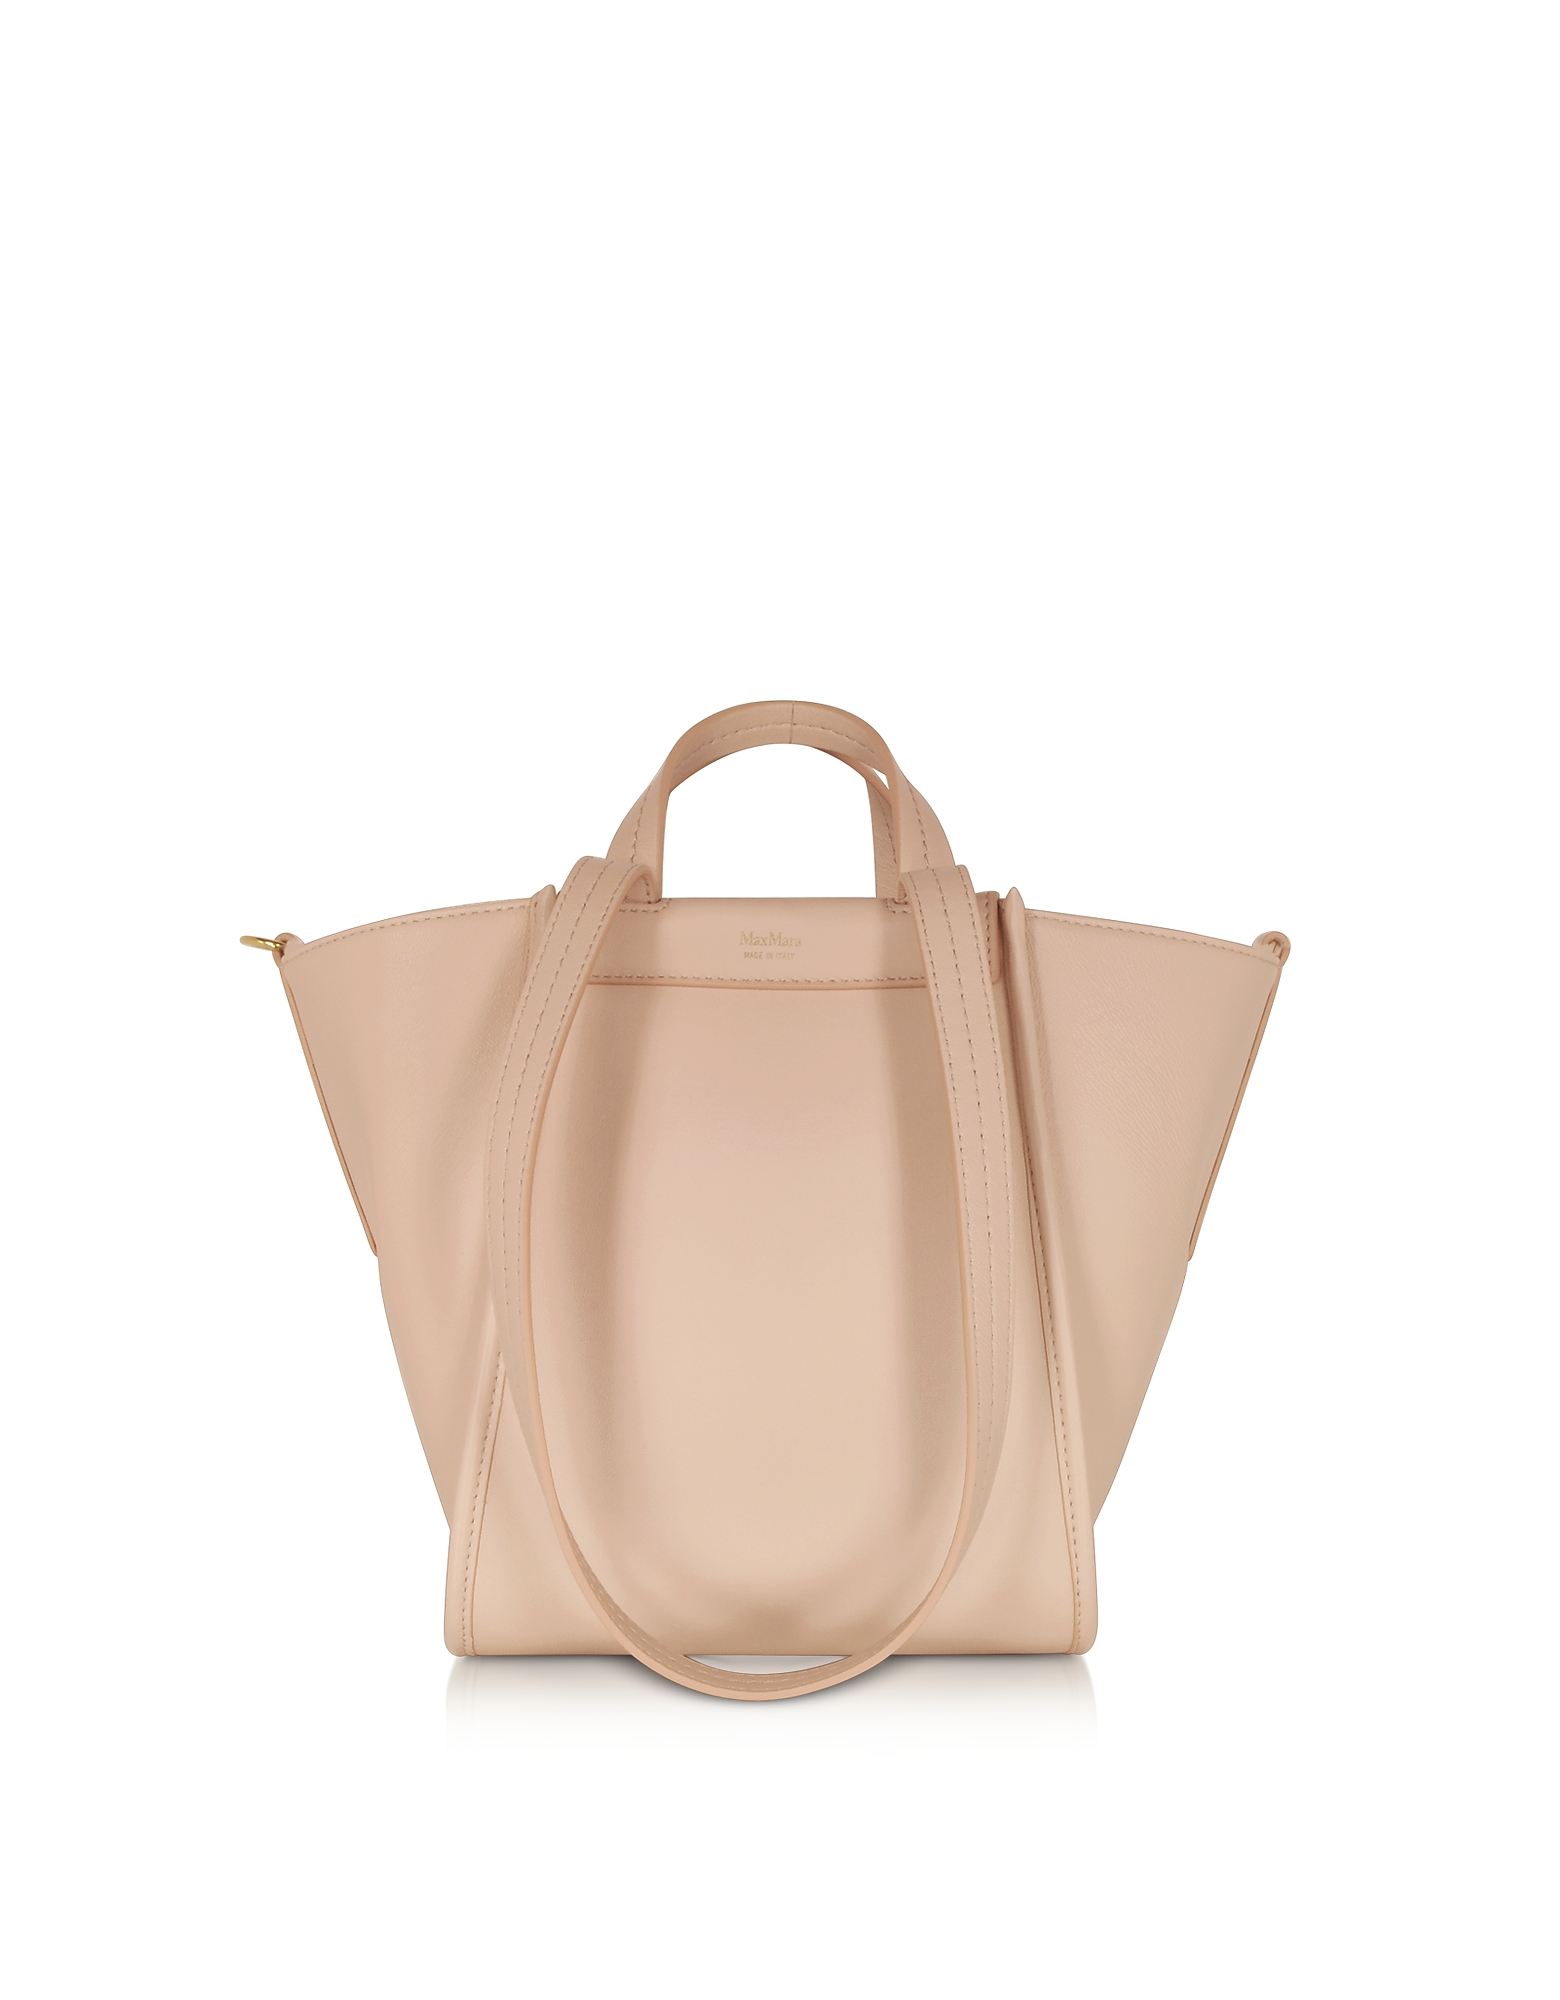 Max Mara Designer Handbags, Pure Leather and Cashmere Reversible Small Tote